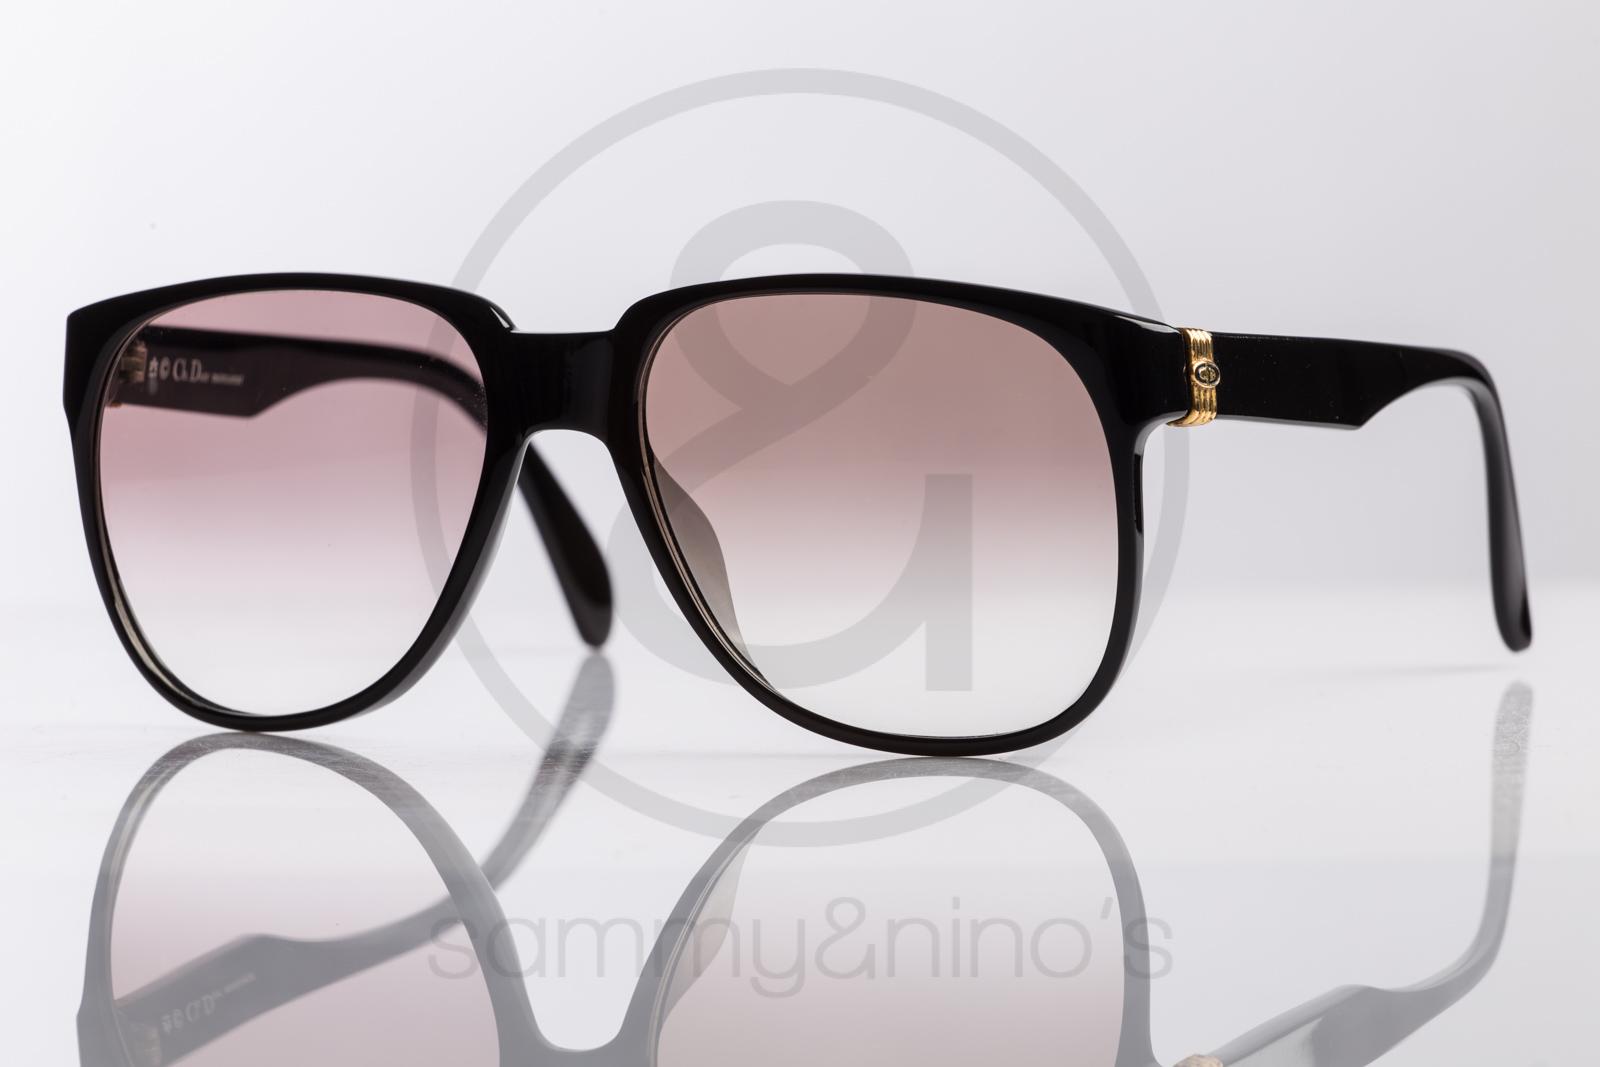 Dior Glasses Frame 2015 : Christian Dior Monsieur 2317 Sammy & Ninos Store